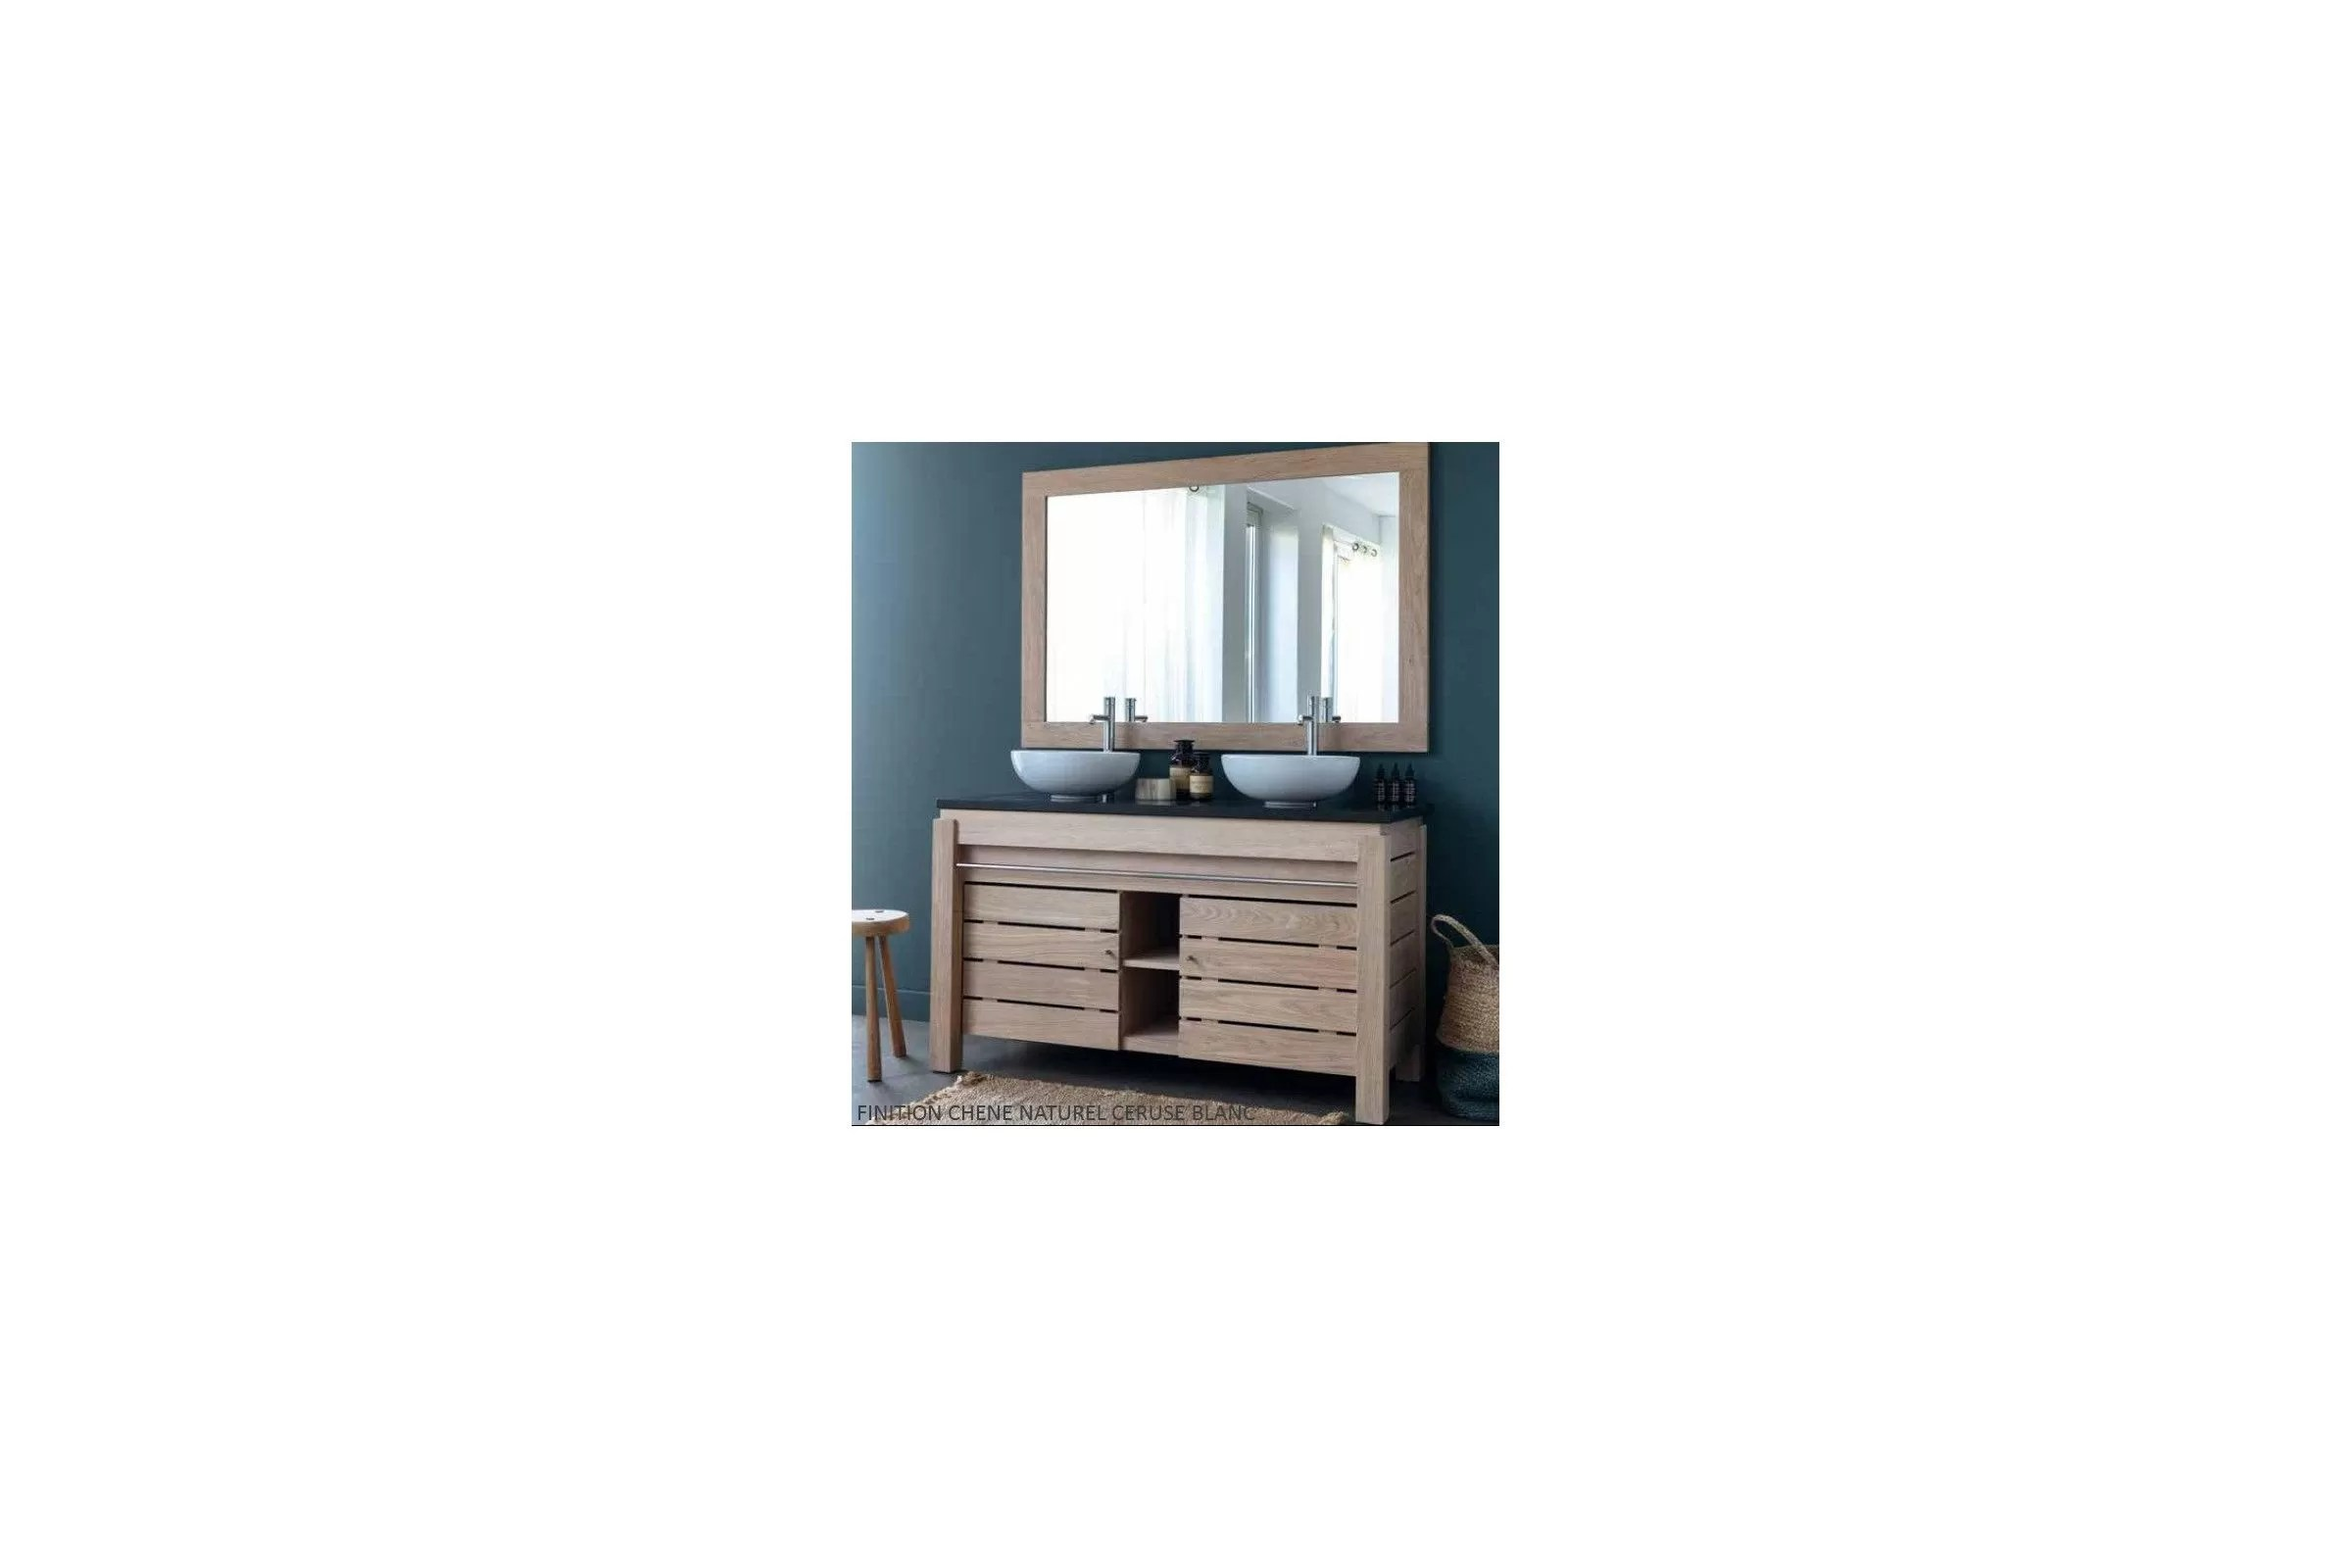 meuble double vasque en chene massif 133 cm 2 portes line art origin